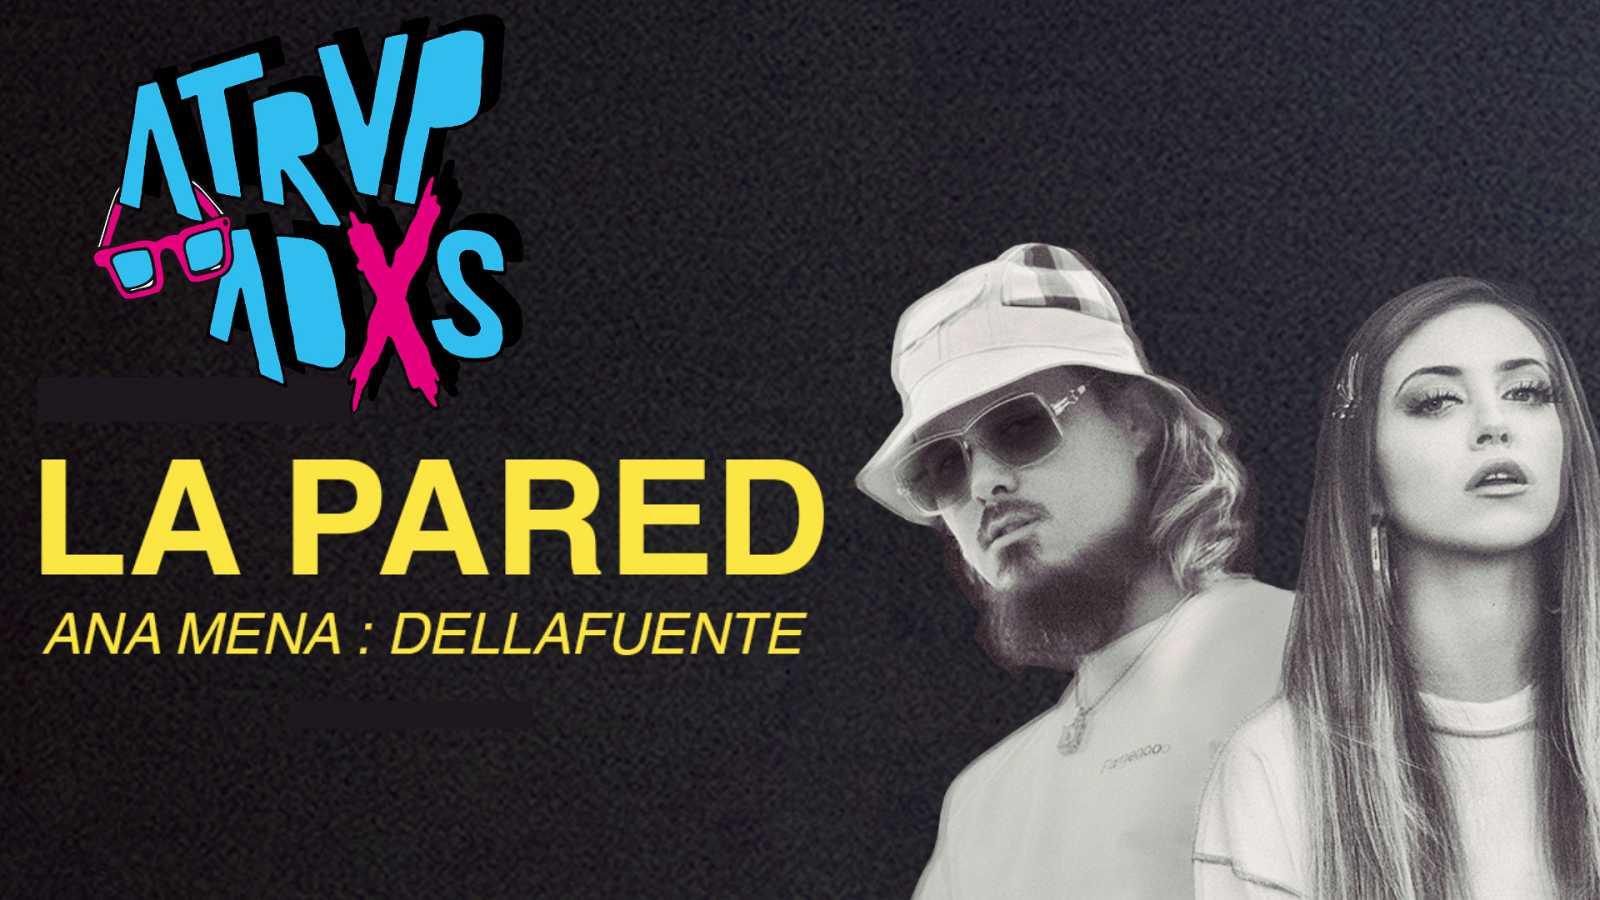 Atrvpadxs - La Pared: Ana Mena + Dellafuente - 18/05/20 - ver ahora